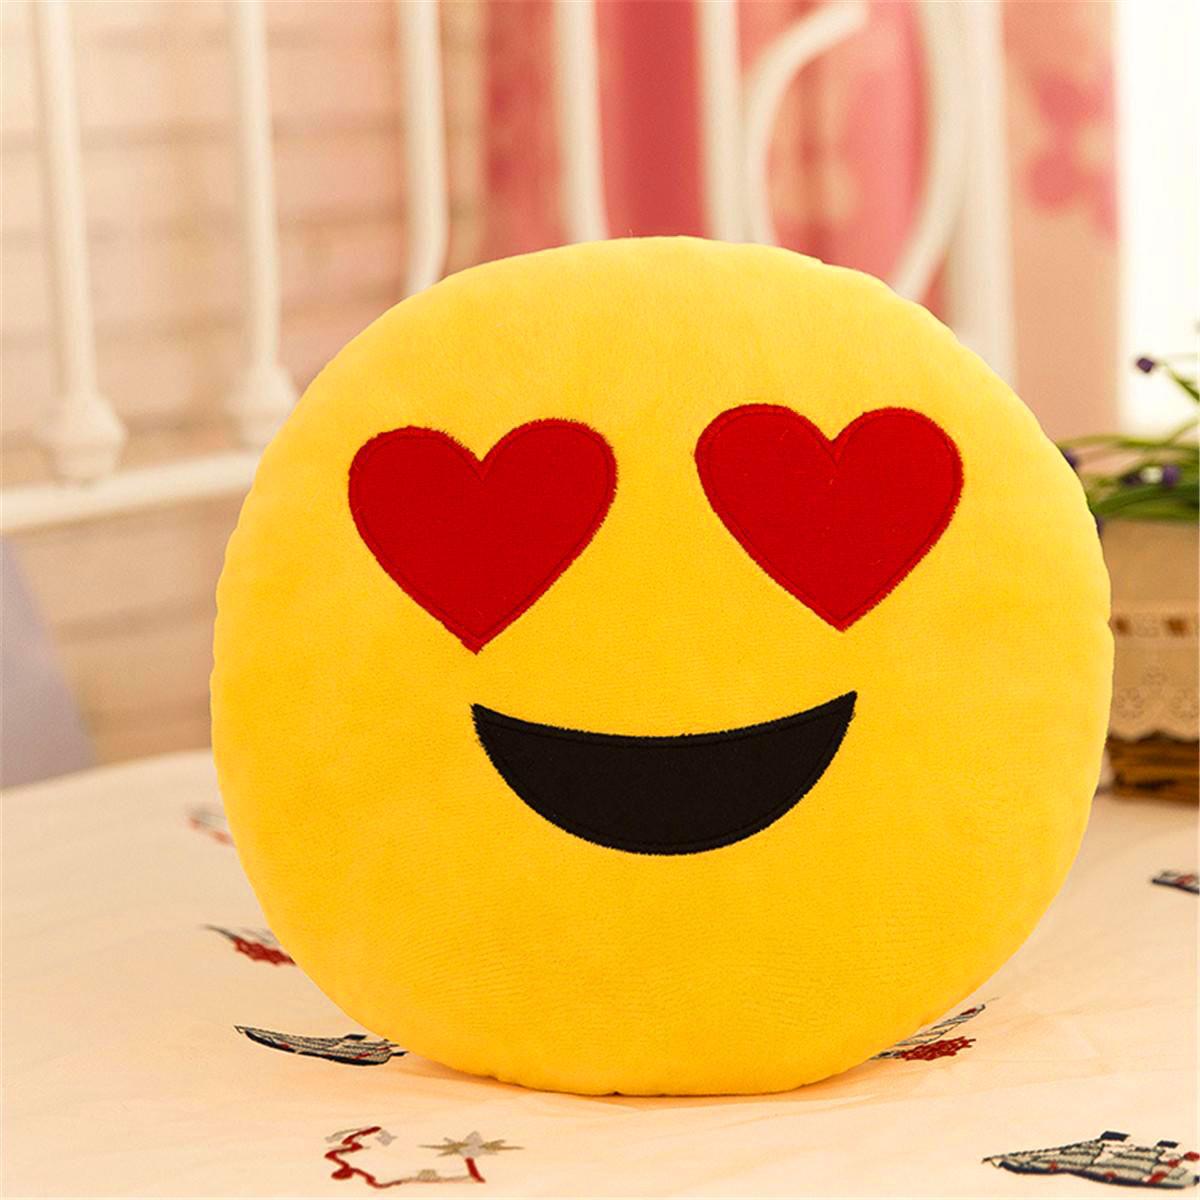 free Girlfriend Whatsapp Profile Images